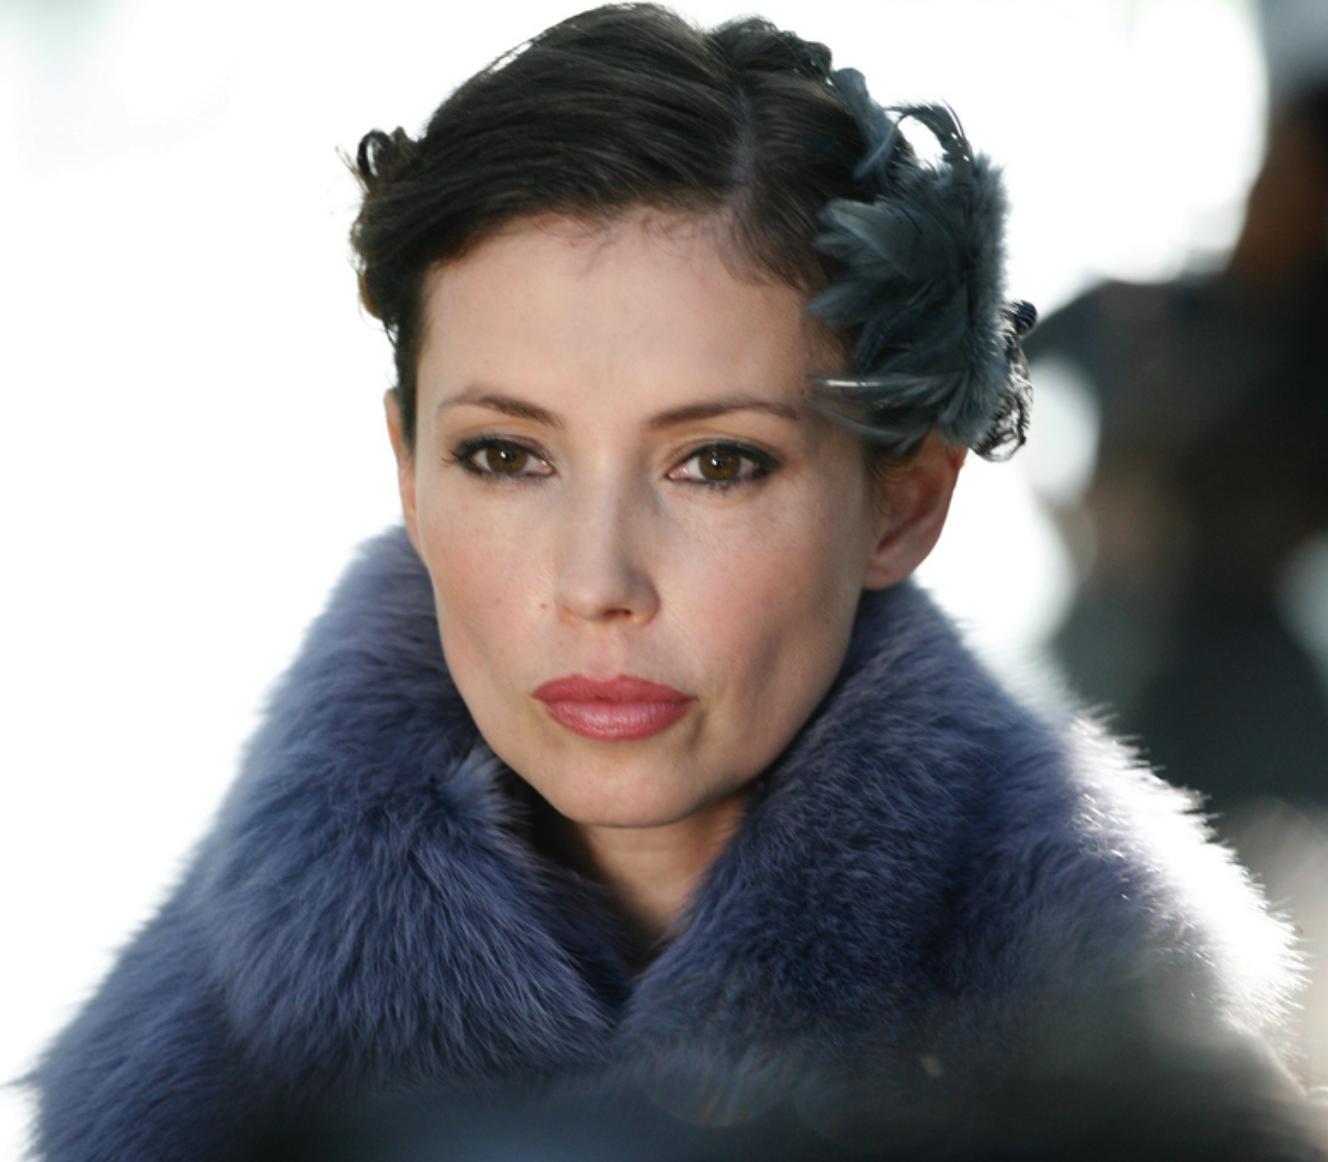 Queen Gwendolyn (Grimm's Snow White)